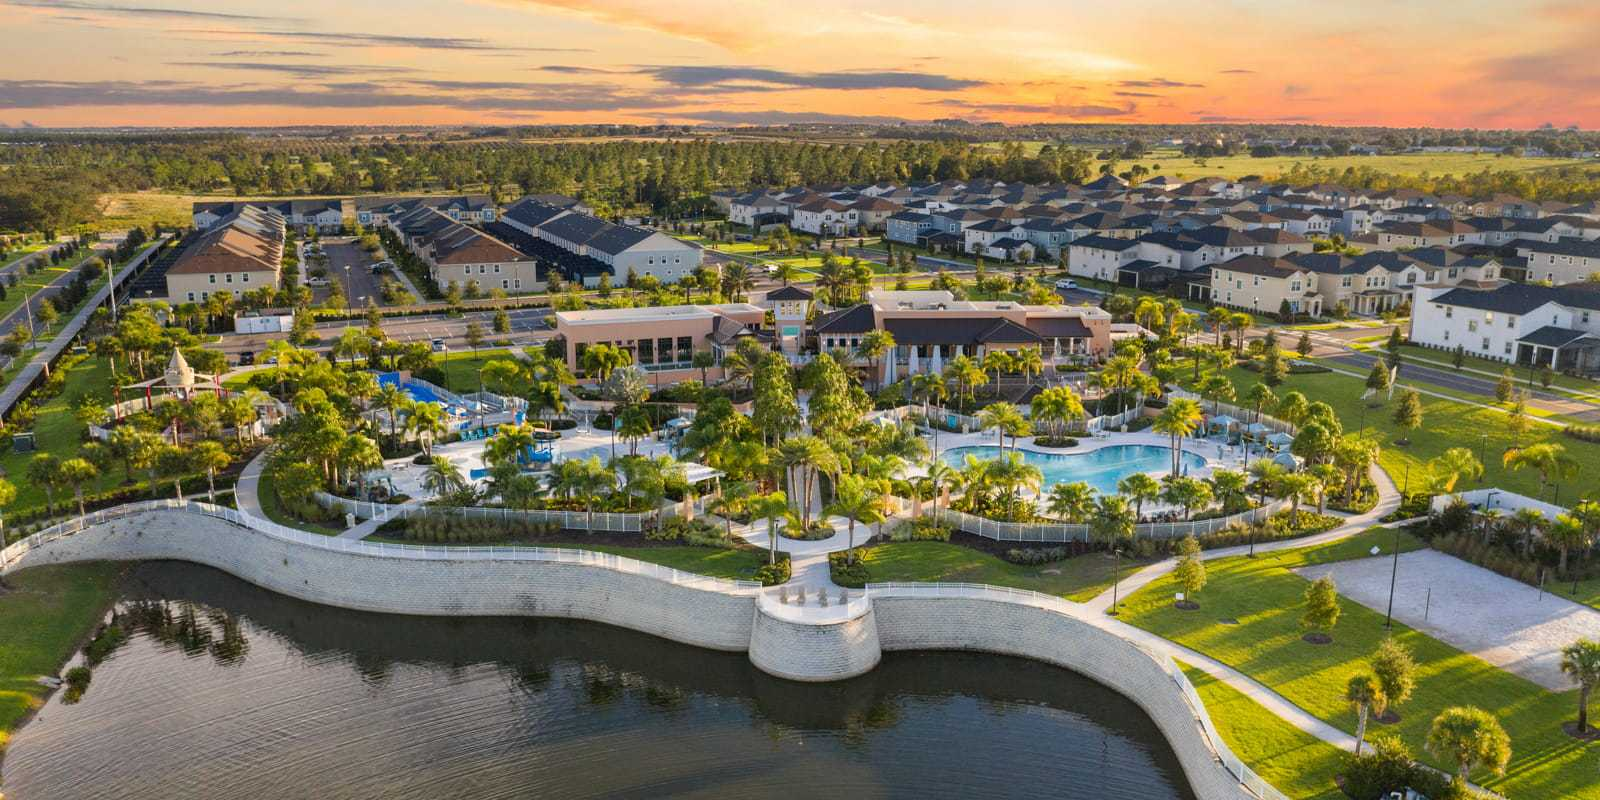 'Solara Resort' by Mattamy Homes-Orlando in Orlando